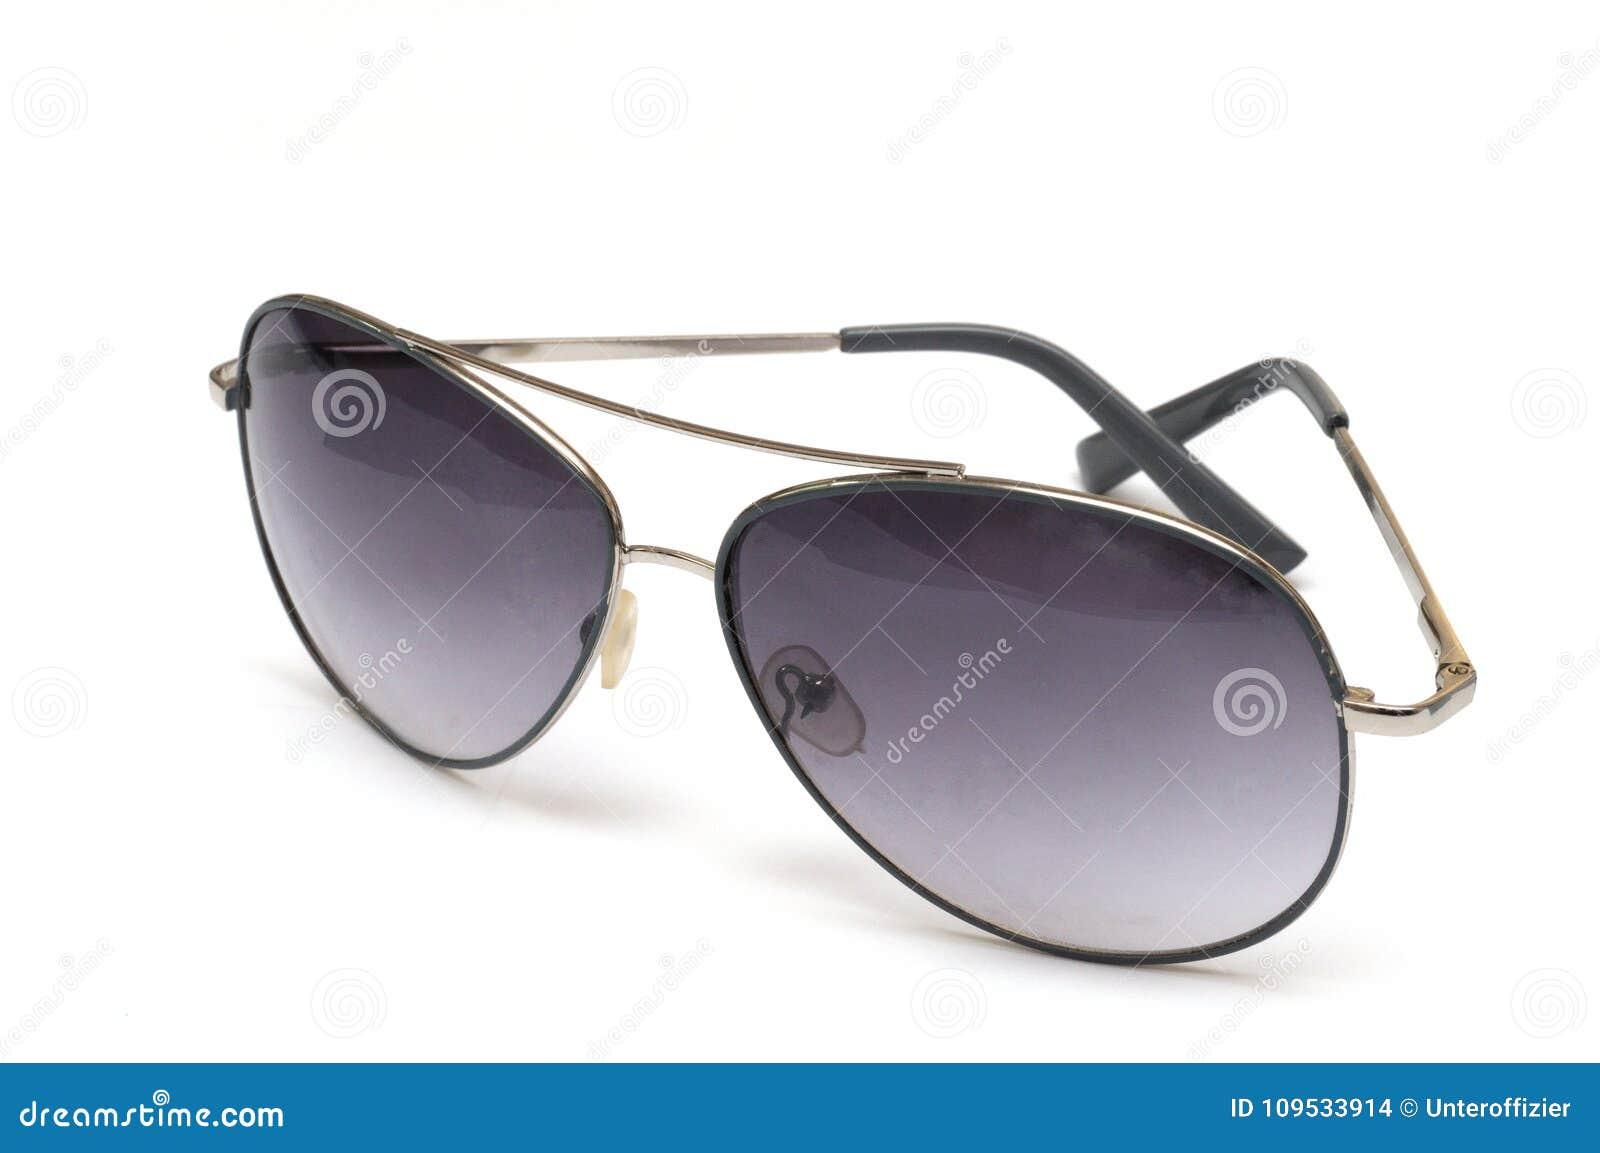 Un par de gafas de sol tipo aviador contra un contexto blanco